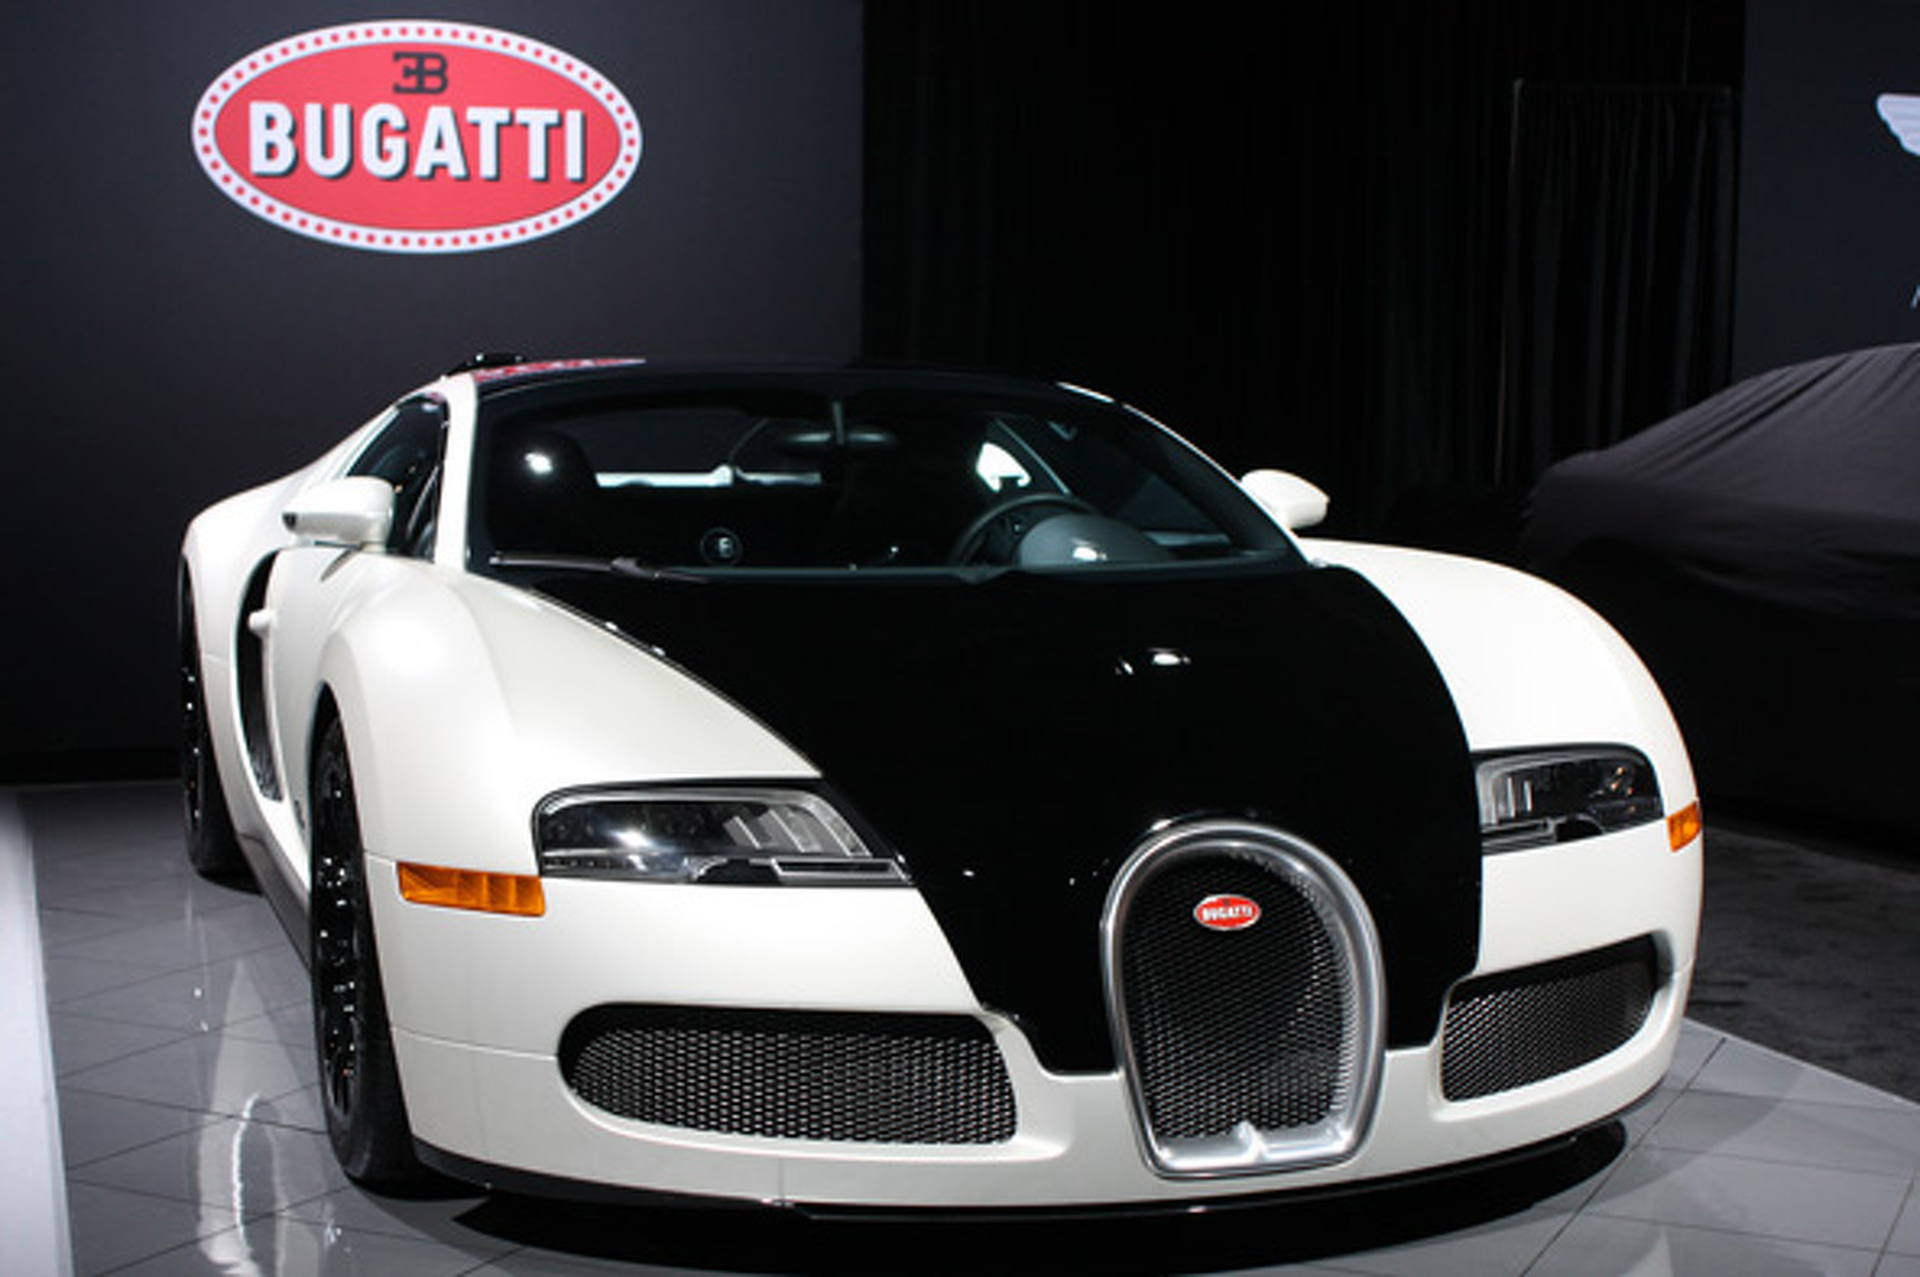 Event Highlight: Bugatti Blanc Noir at the 2012 New York Auto Show